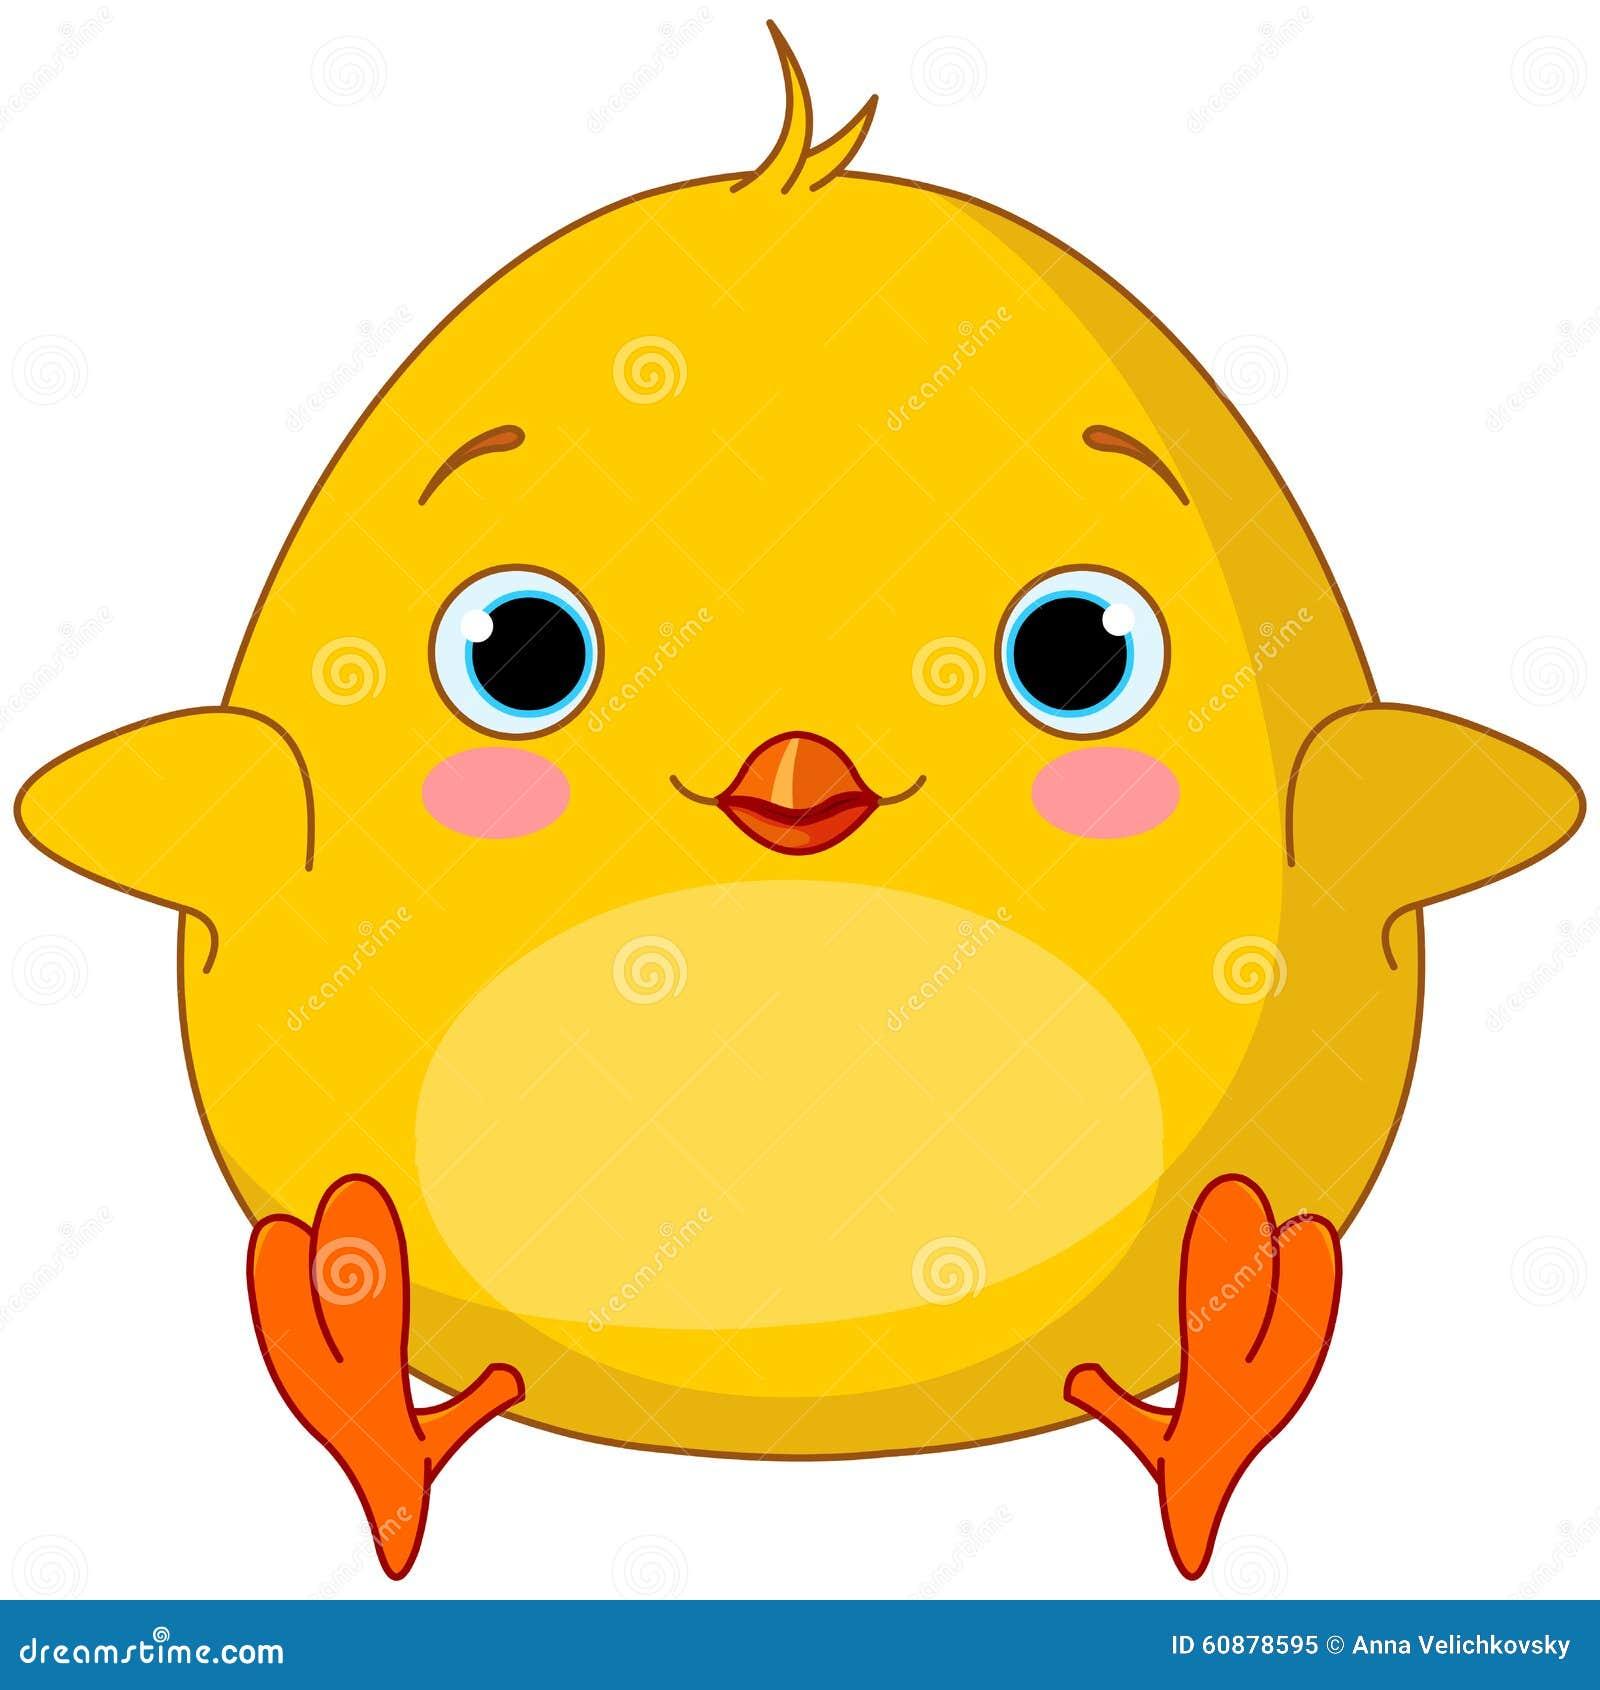 Yellow Chick stock vector. Illustration of chicken, illustration - 60878595